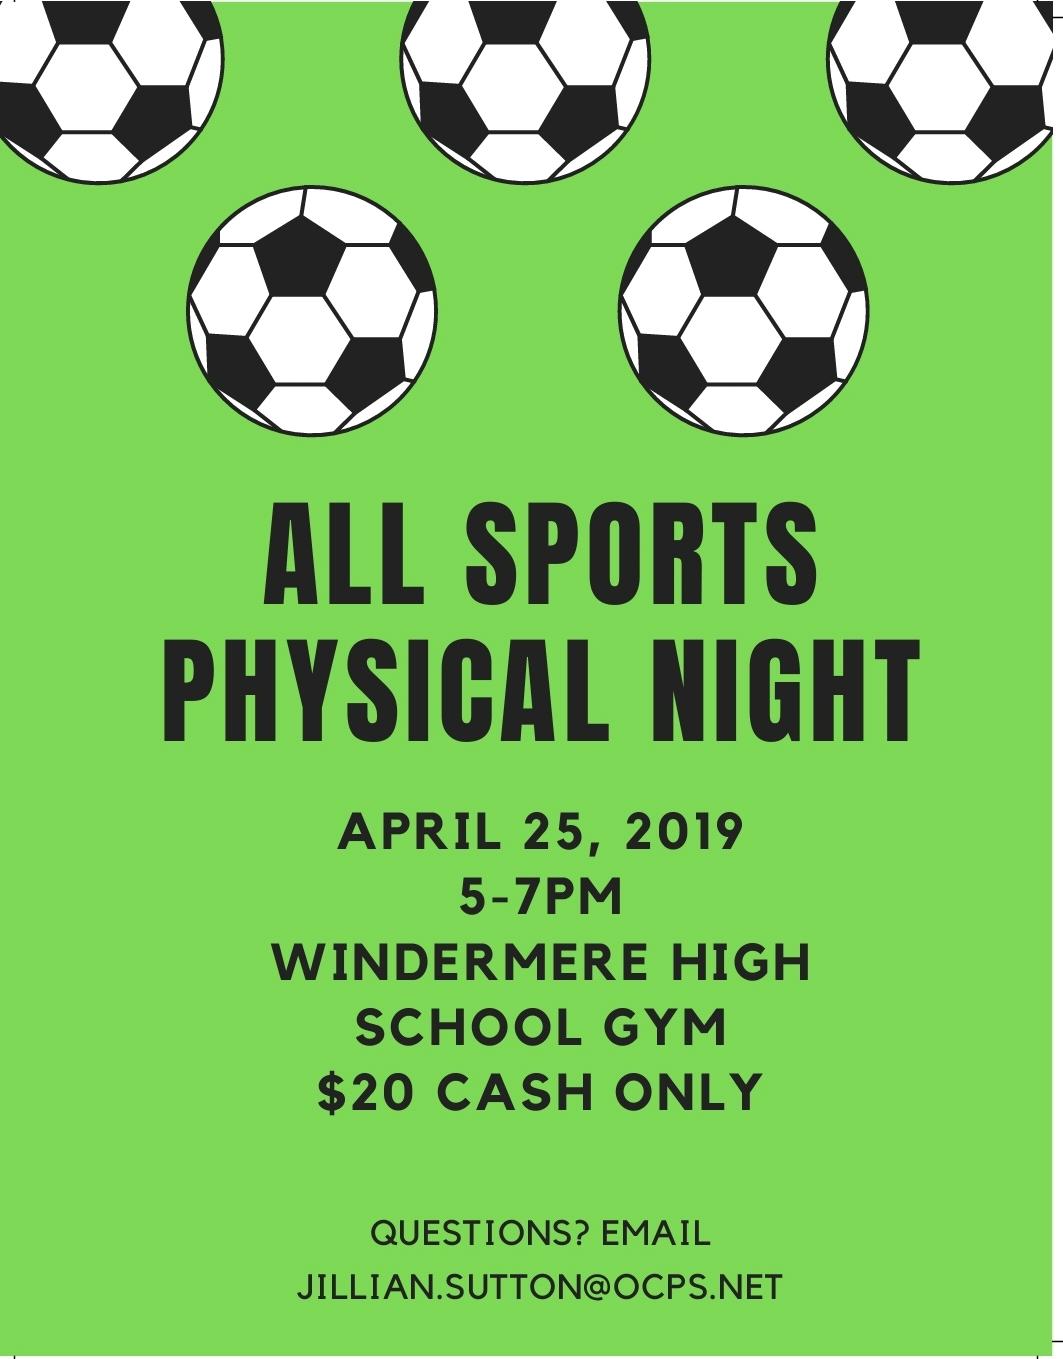 Physical Night April 25th 5PM-7PM